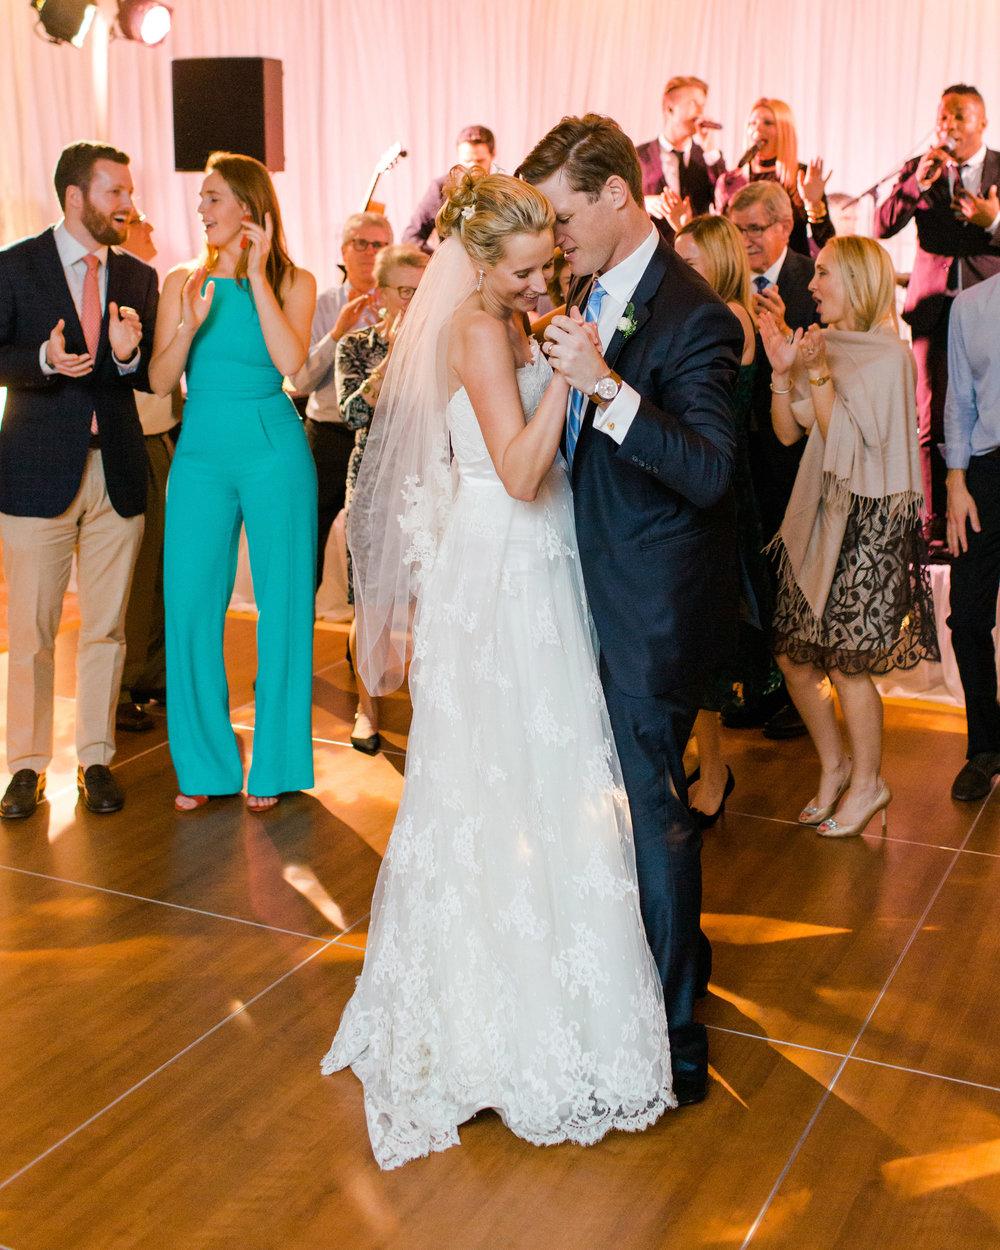 biltmore_santa_barbara_wedding_photos_coral_casino_069.jpg